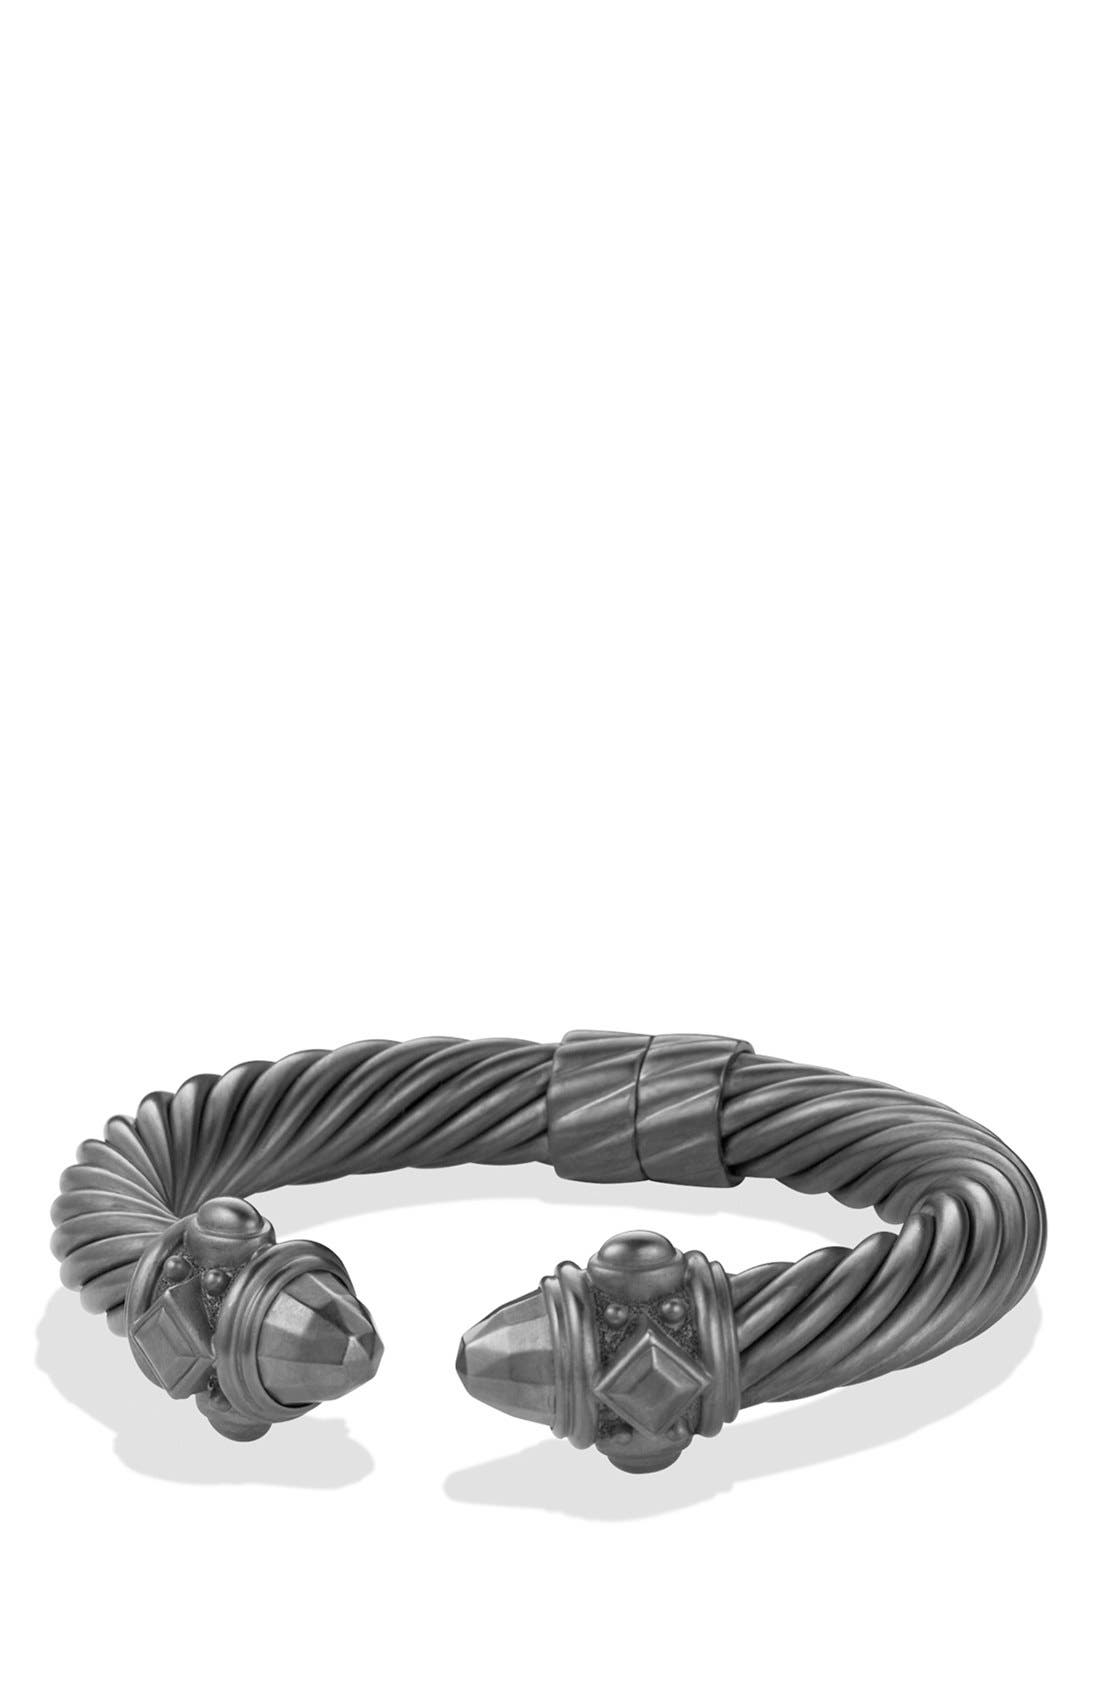 Main Image - David Yurman 'Renaissance' Bracelet